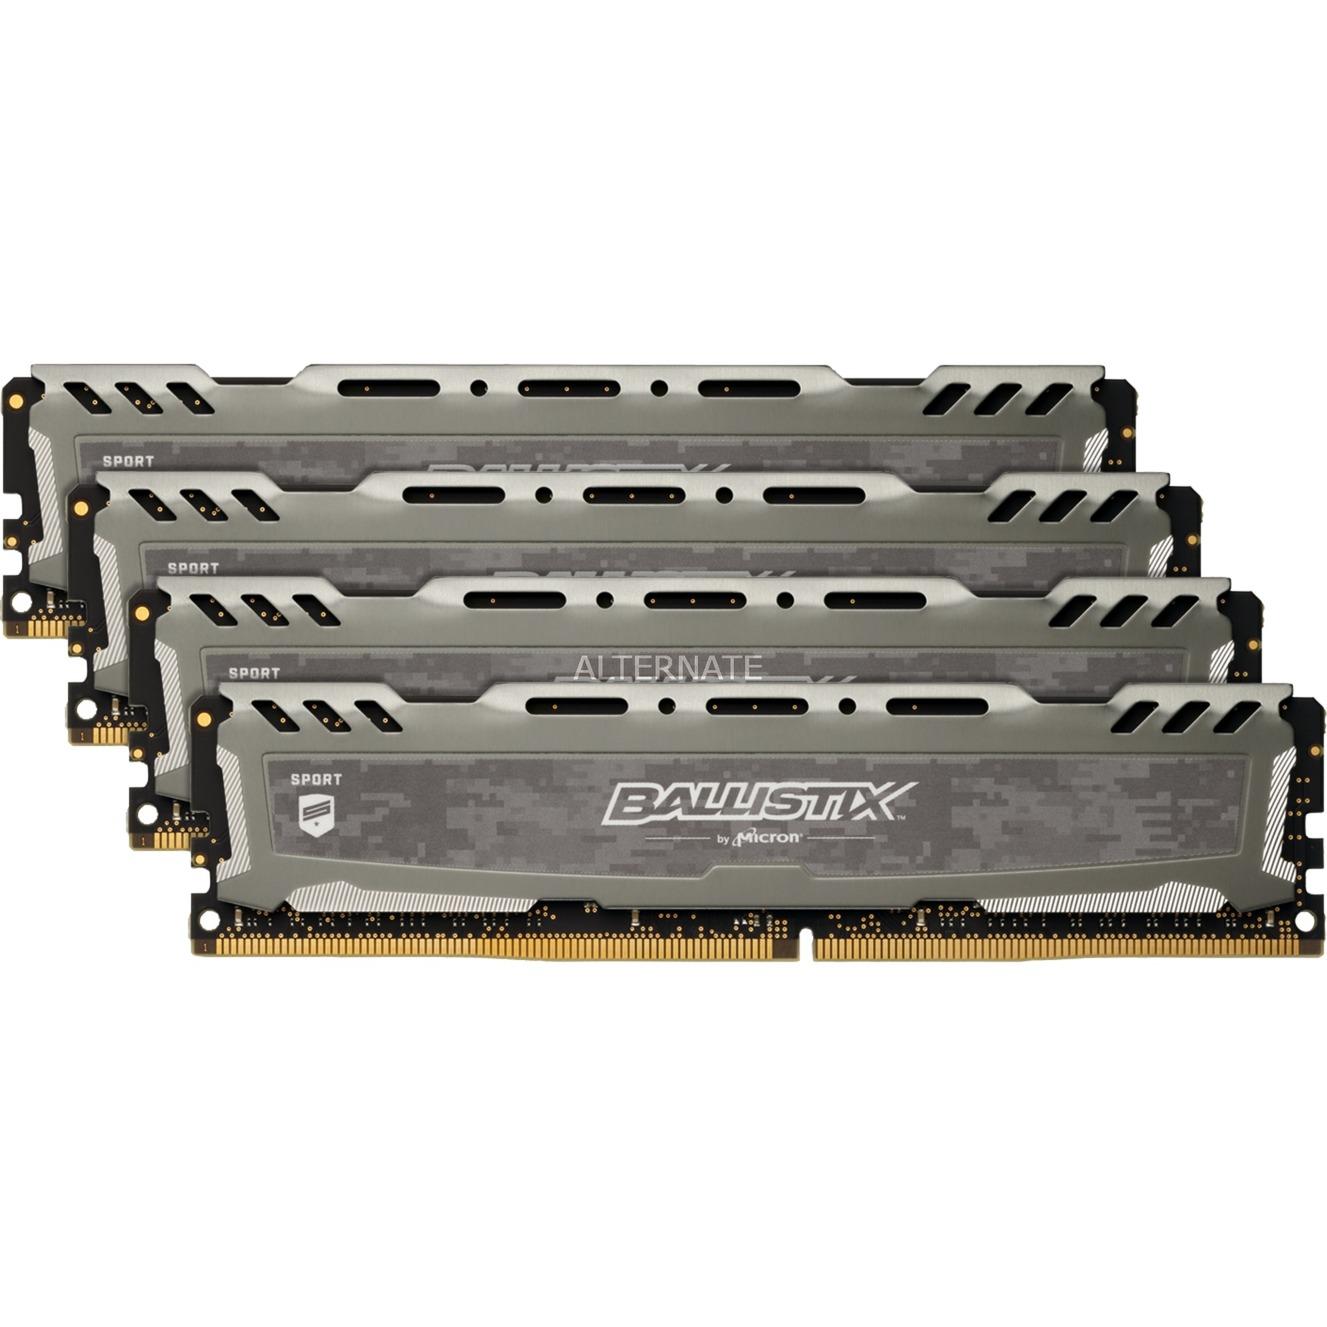 Ballistix Sport LT módulo de memoria 16 GB DDR4 2666 MHz, Memoria RAM